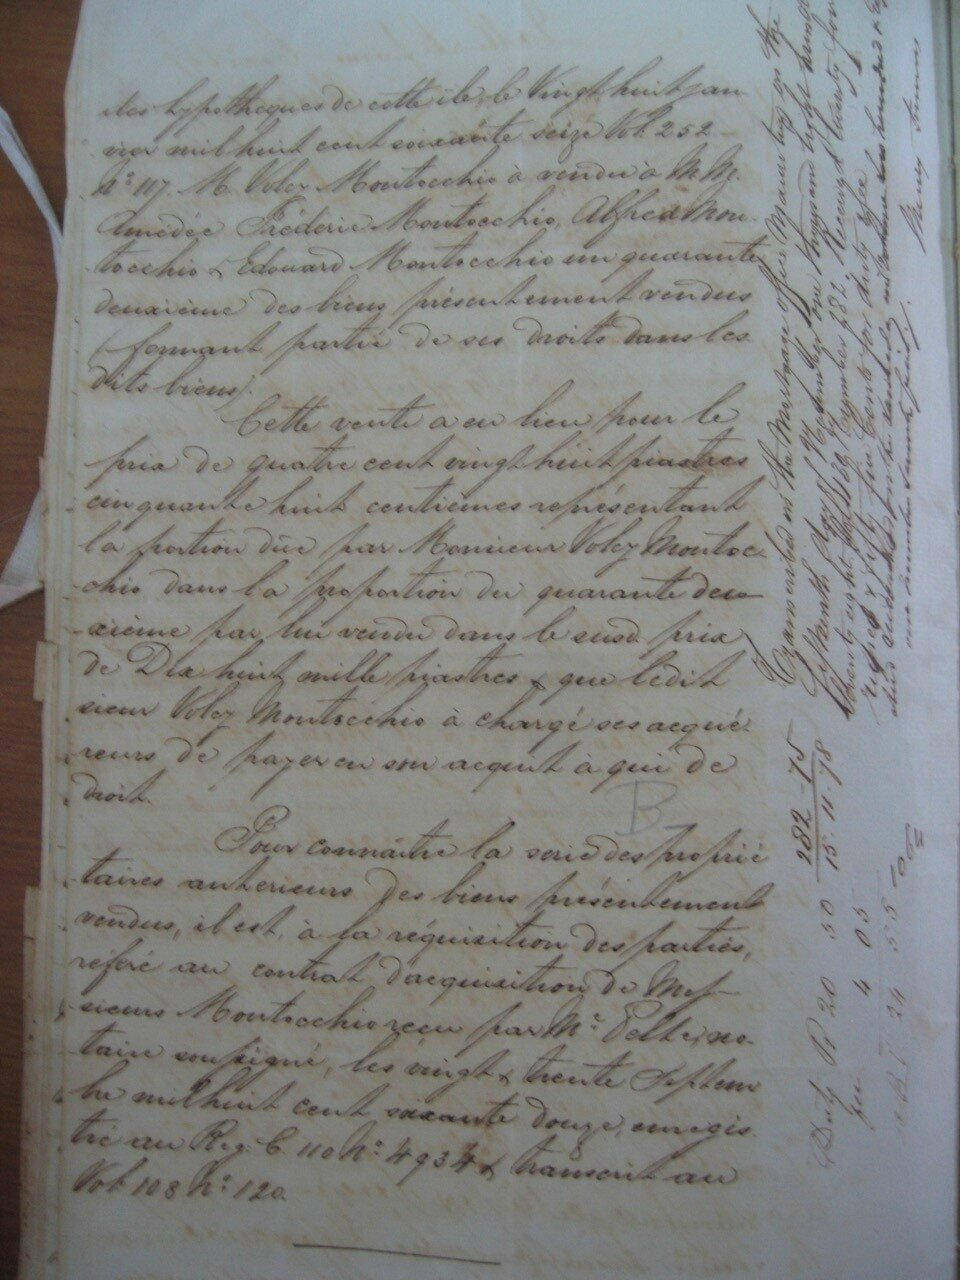 Beau Rivage_Contrat de vente 1878 p9_Marie Helene SHIM